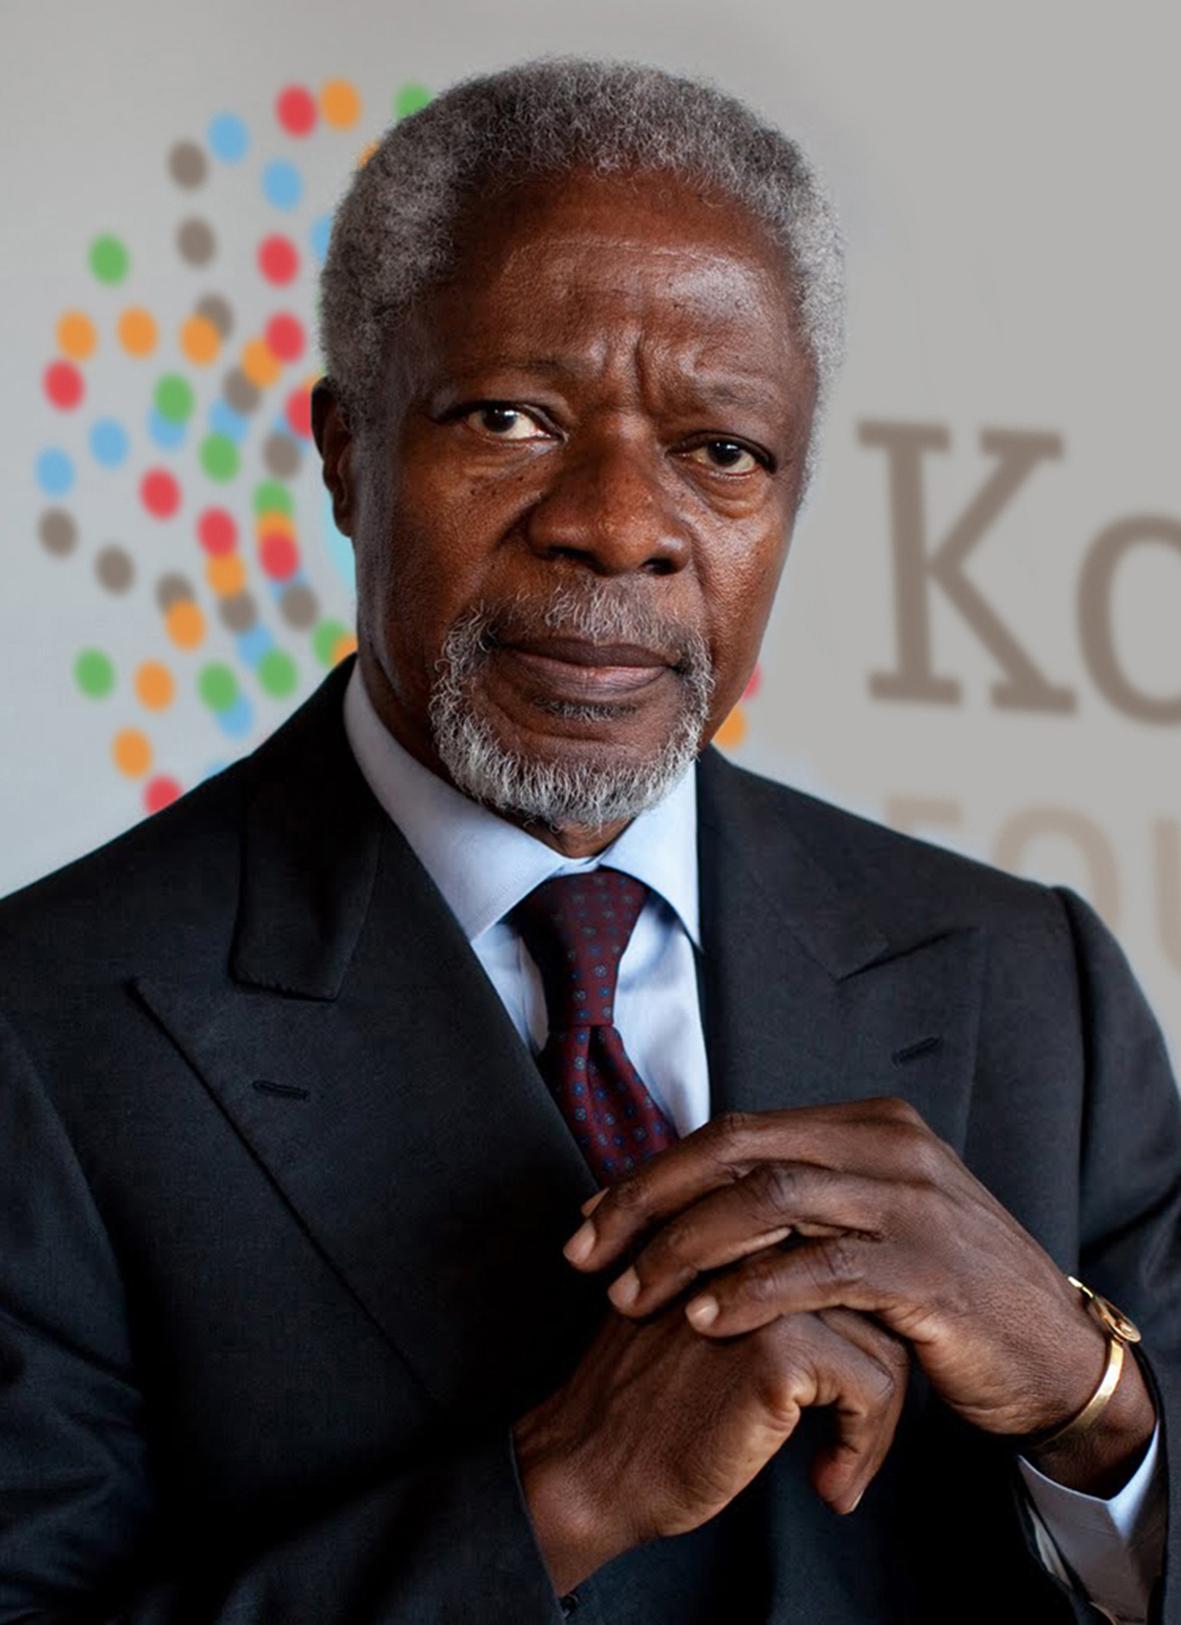 Kofi Annan opens the Bonavero Institute of Human Rights